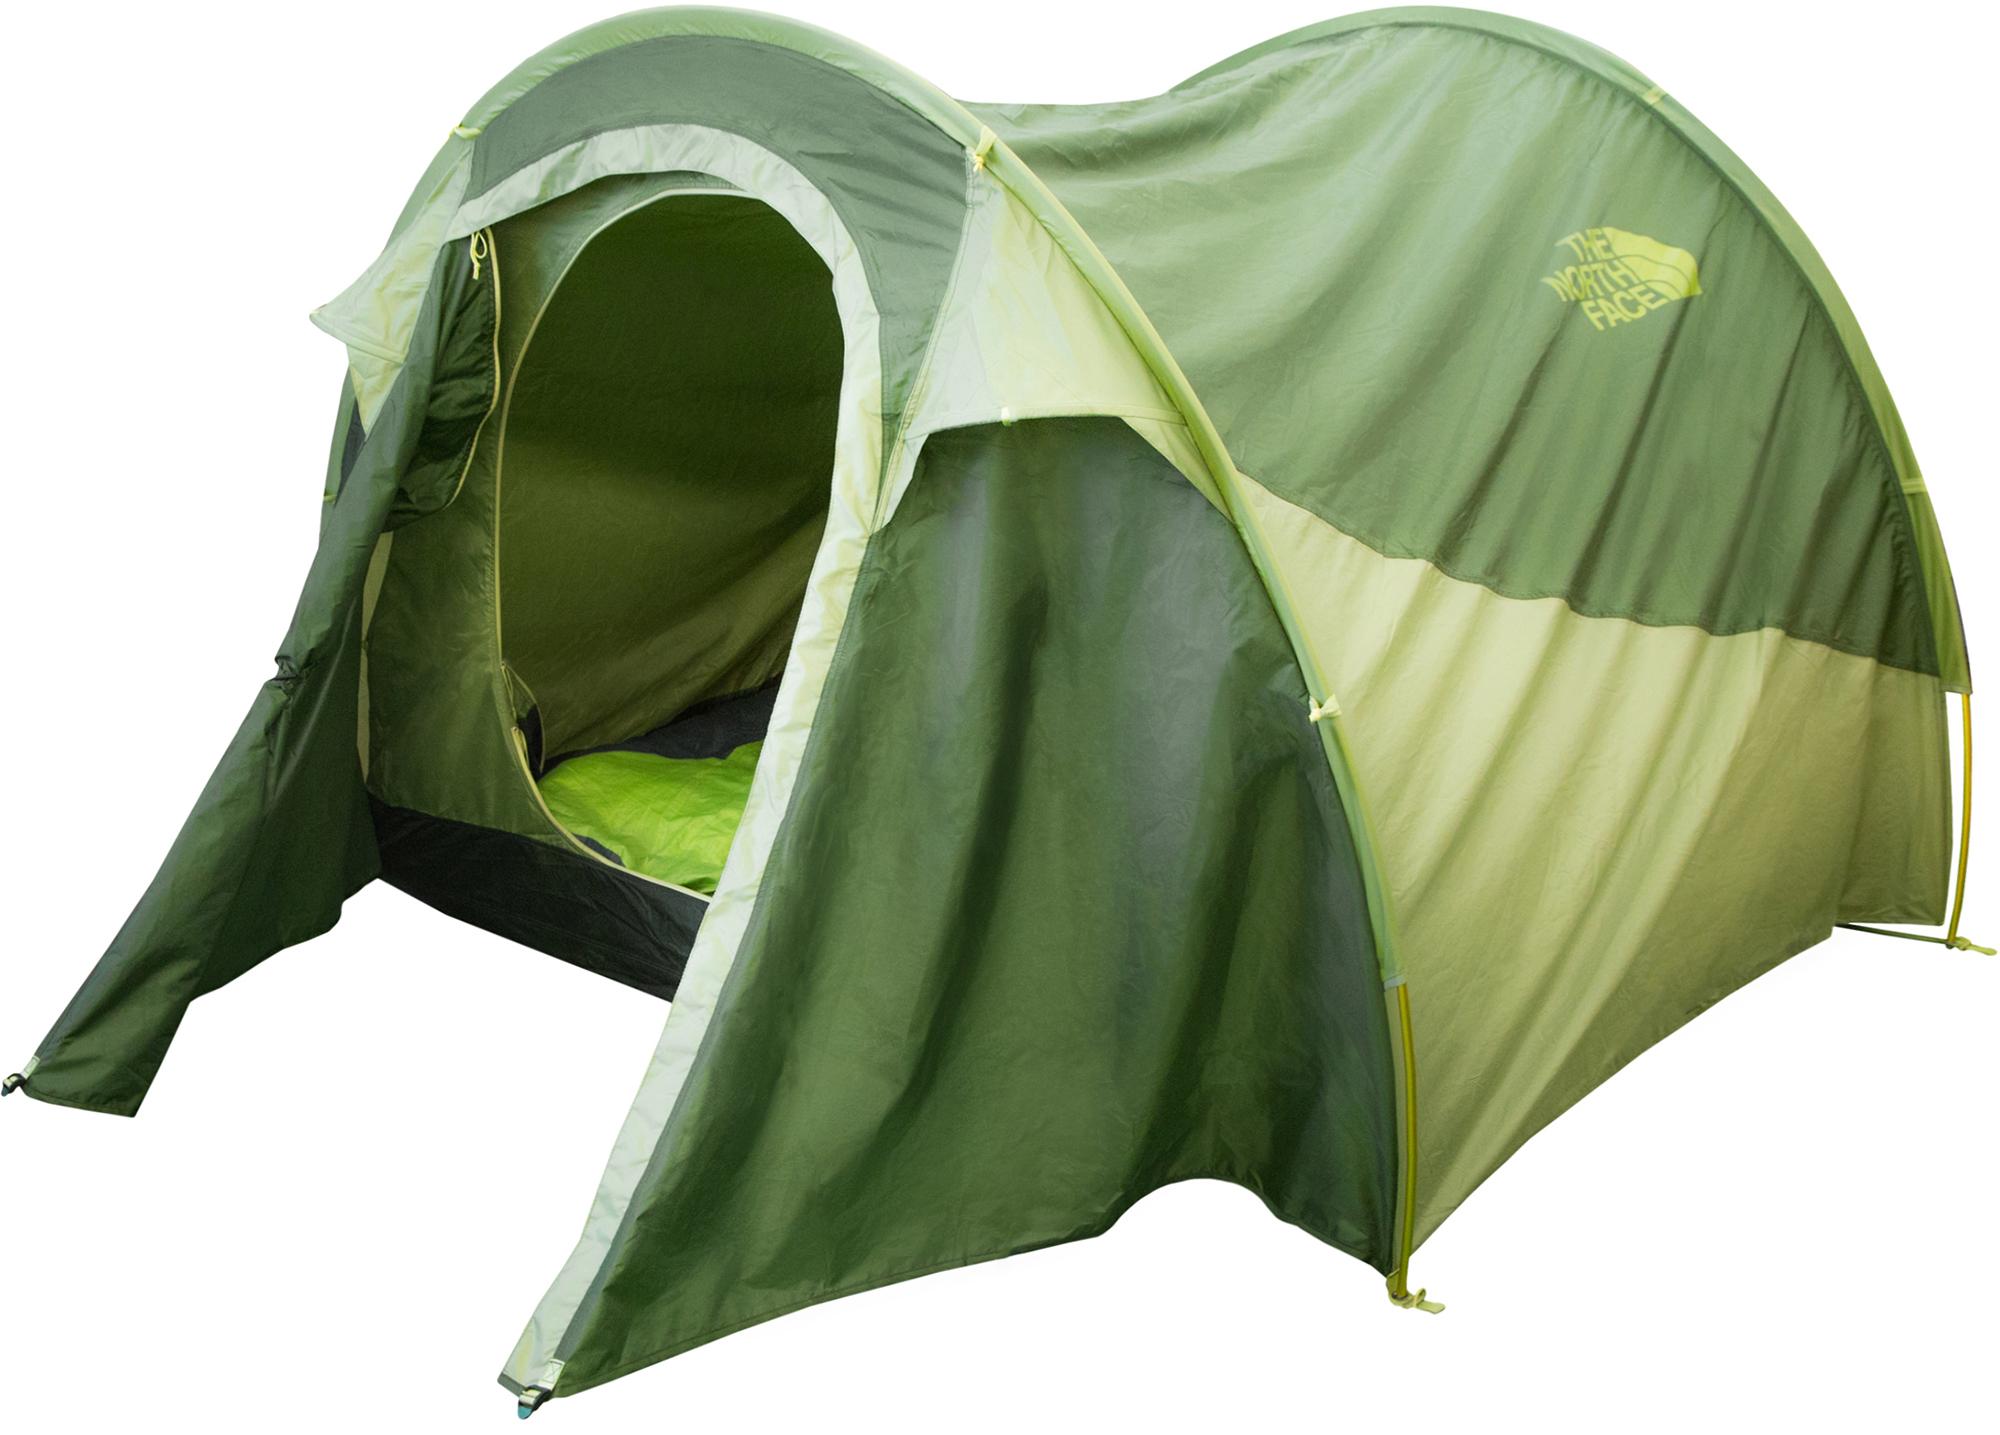 Фото - The North Face Heyerdahl 3 палатка greenhouse fct 32 трехместная